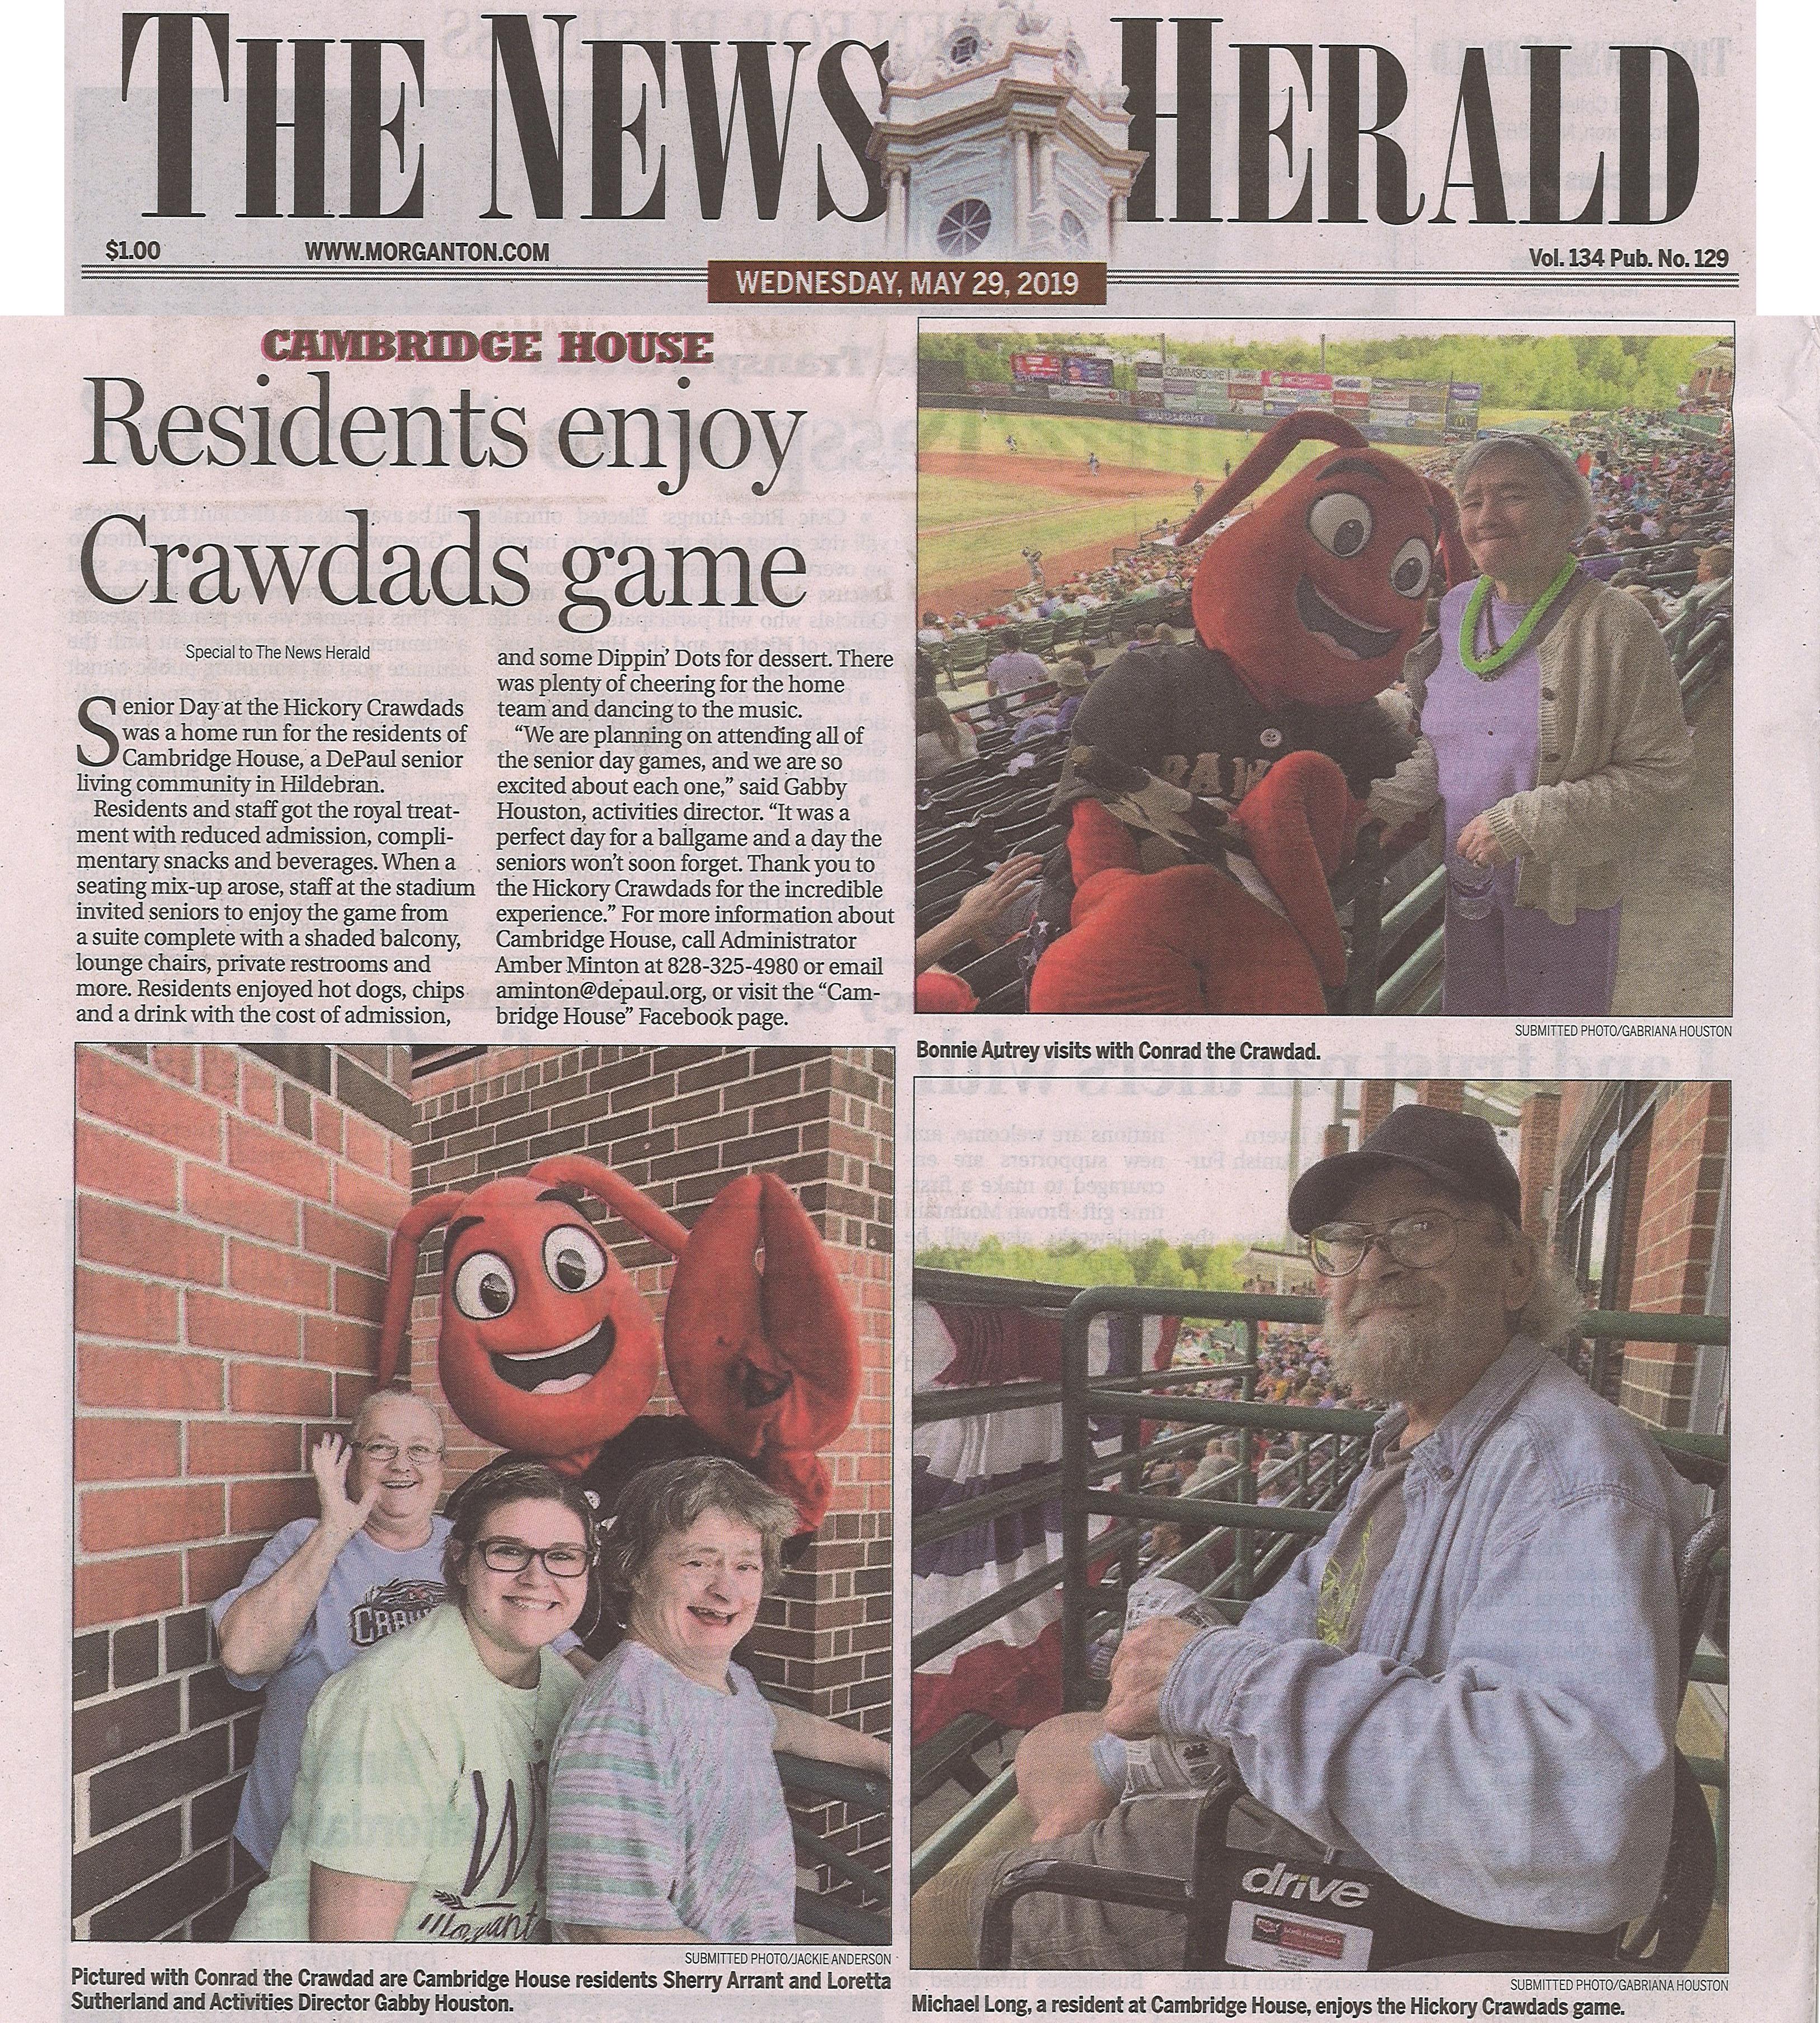 CH Baseball, 5.29.19 News Herald(cropped)